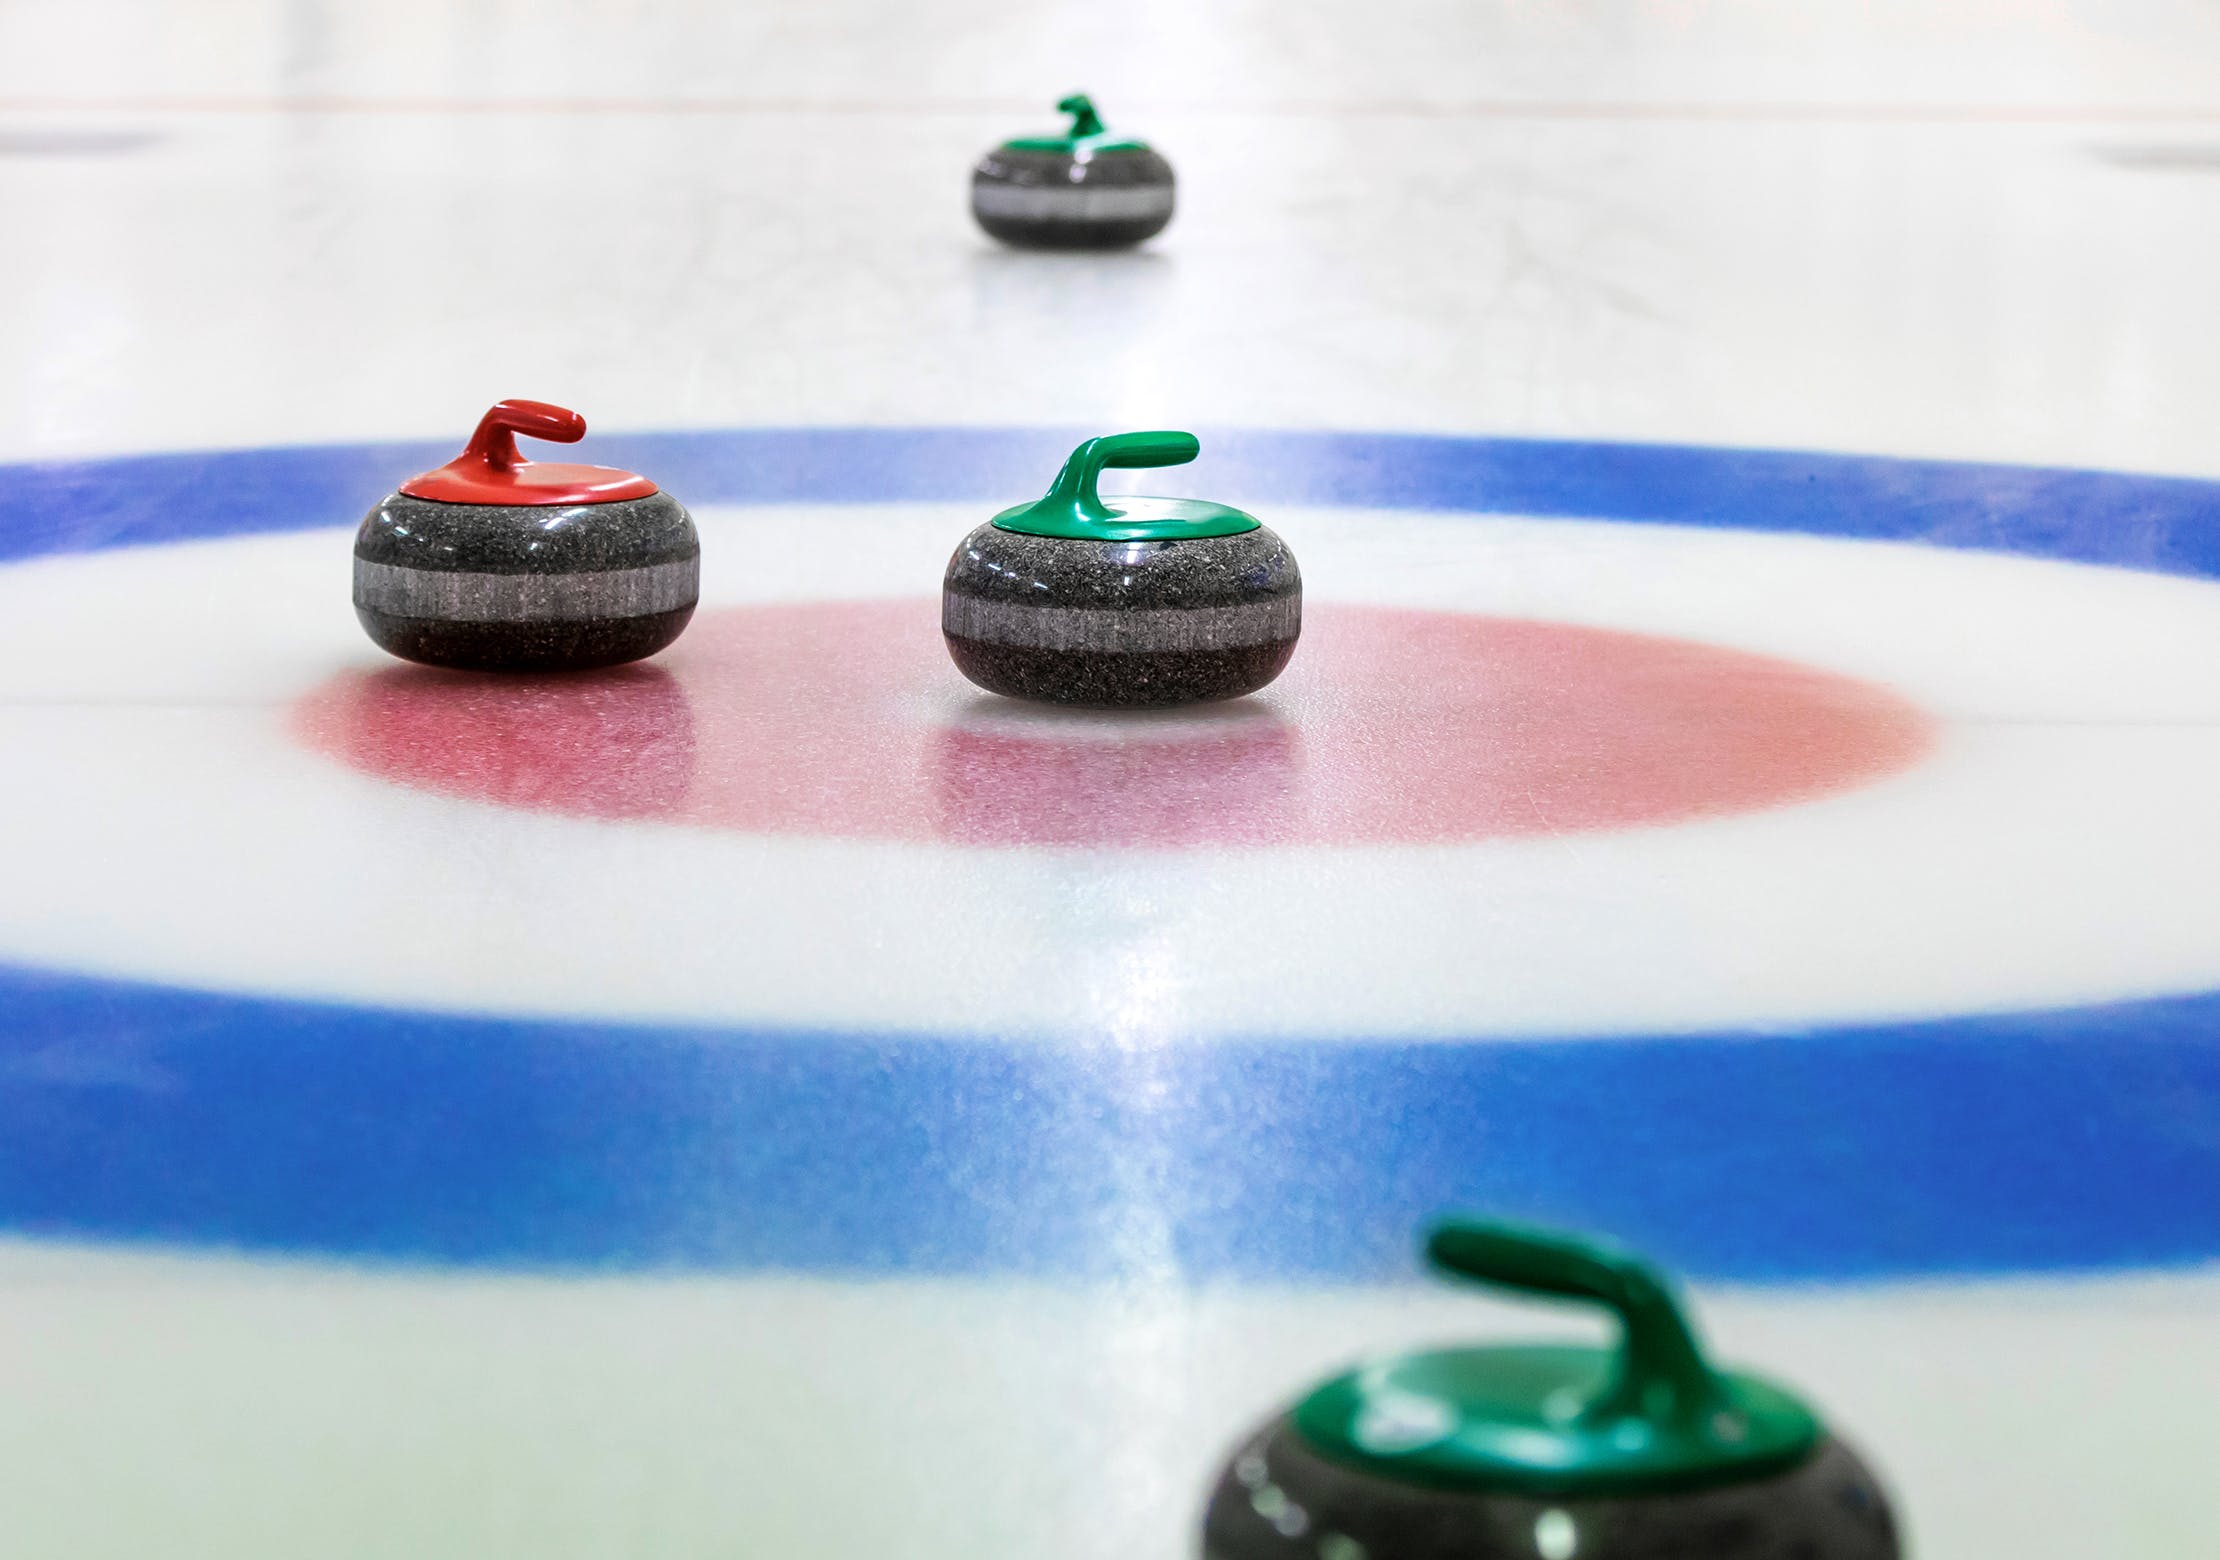 Tournoi de curling - Tournois Interfacs CEPSUM